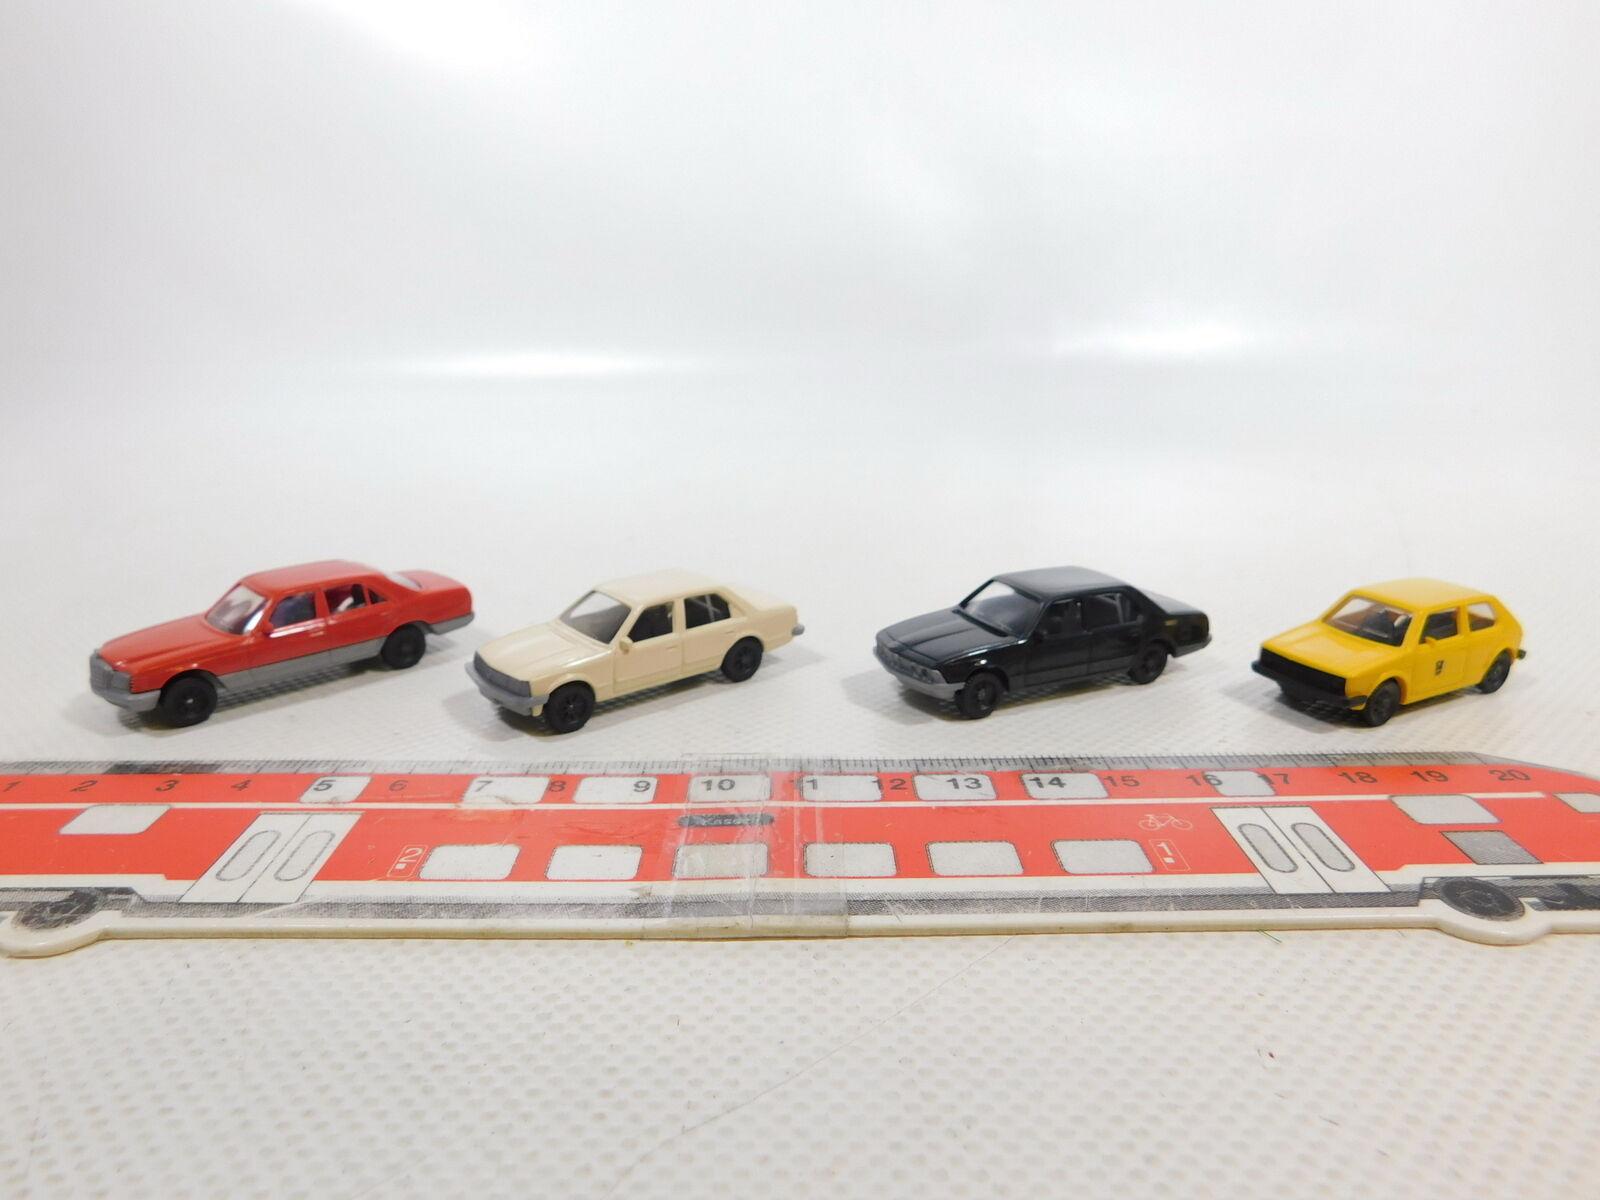 CA601-0,5 x fleischmann 1 87 H0 Car  BMW + Mercedes+Vauxhall+VW post,Very Good